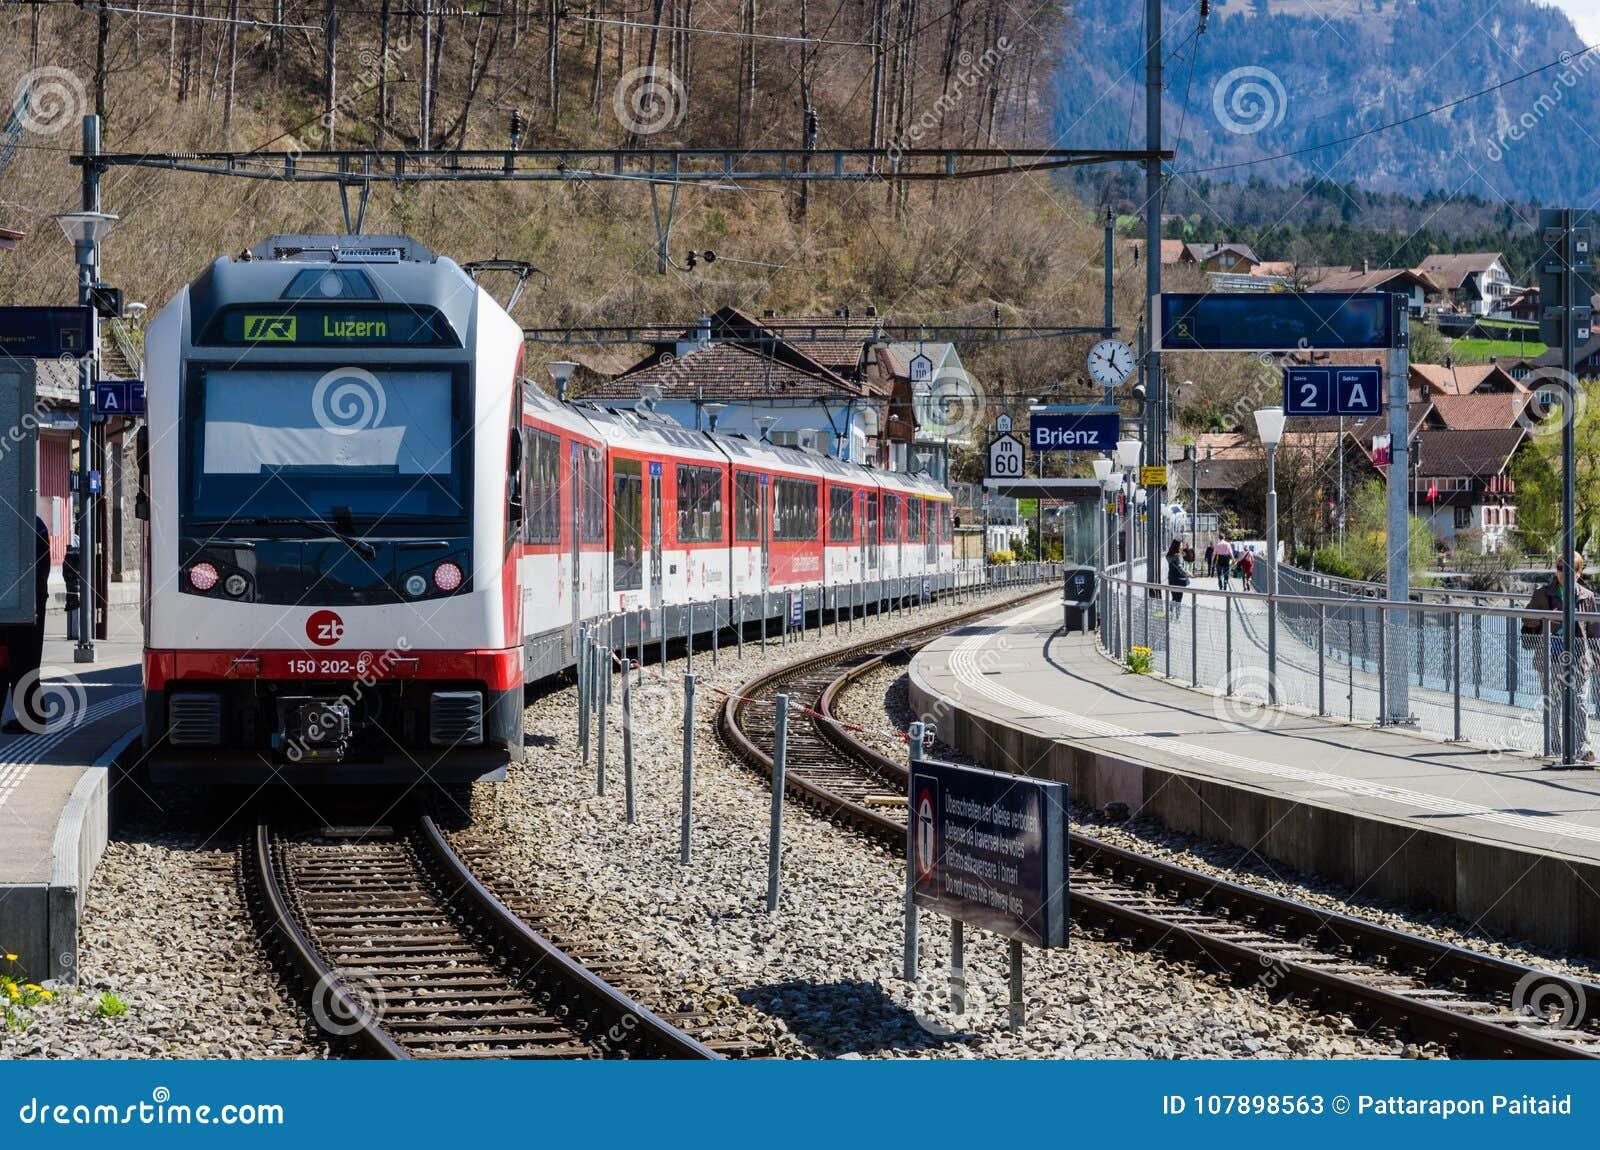 A train at Brienz station